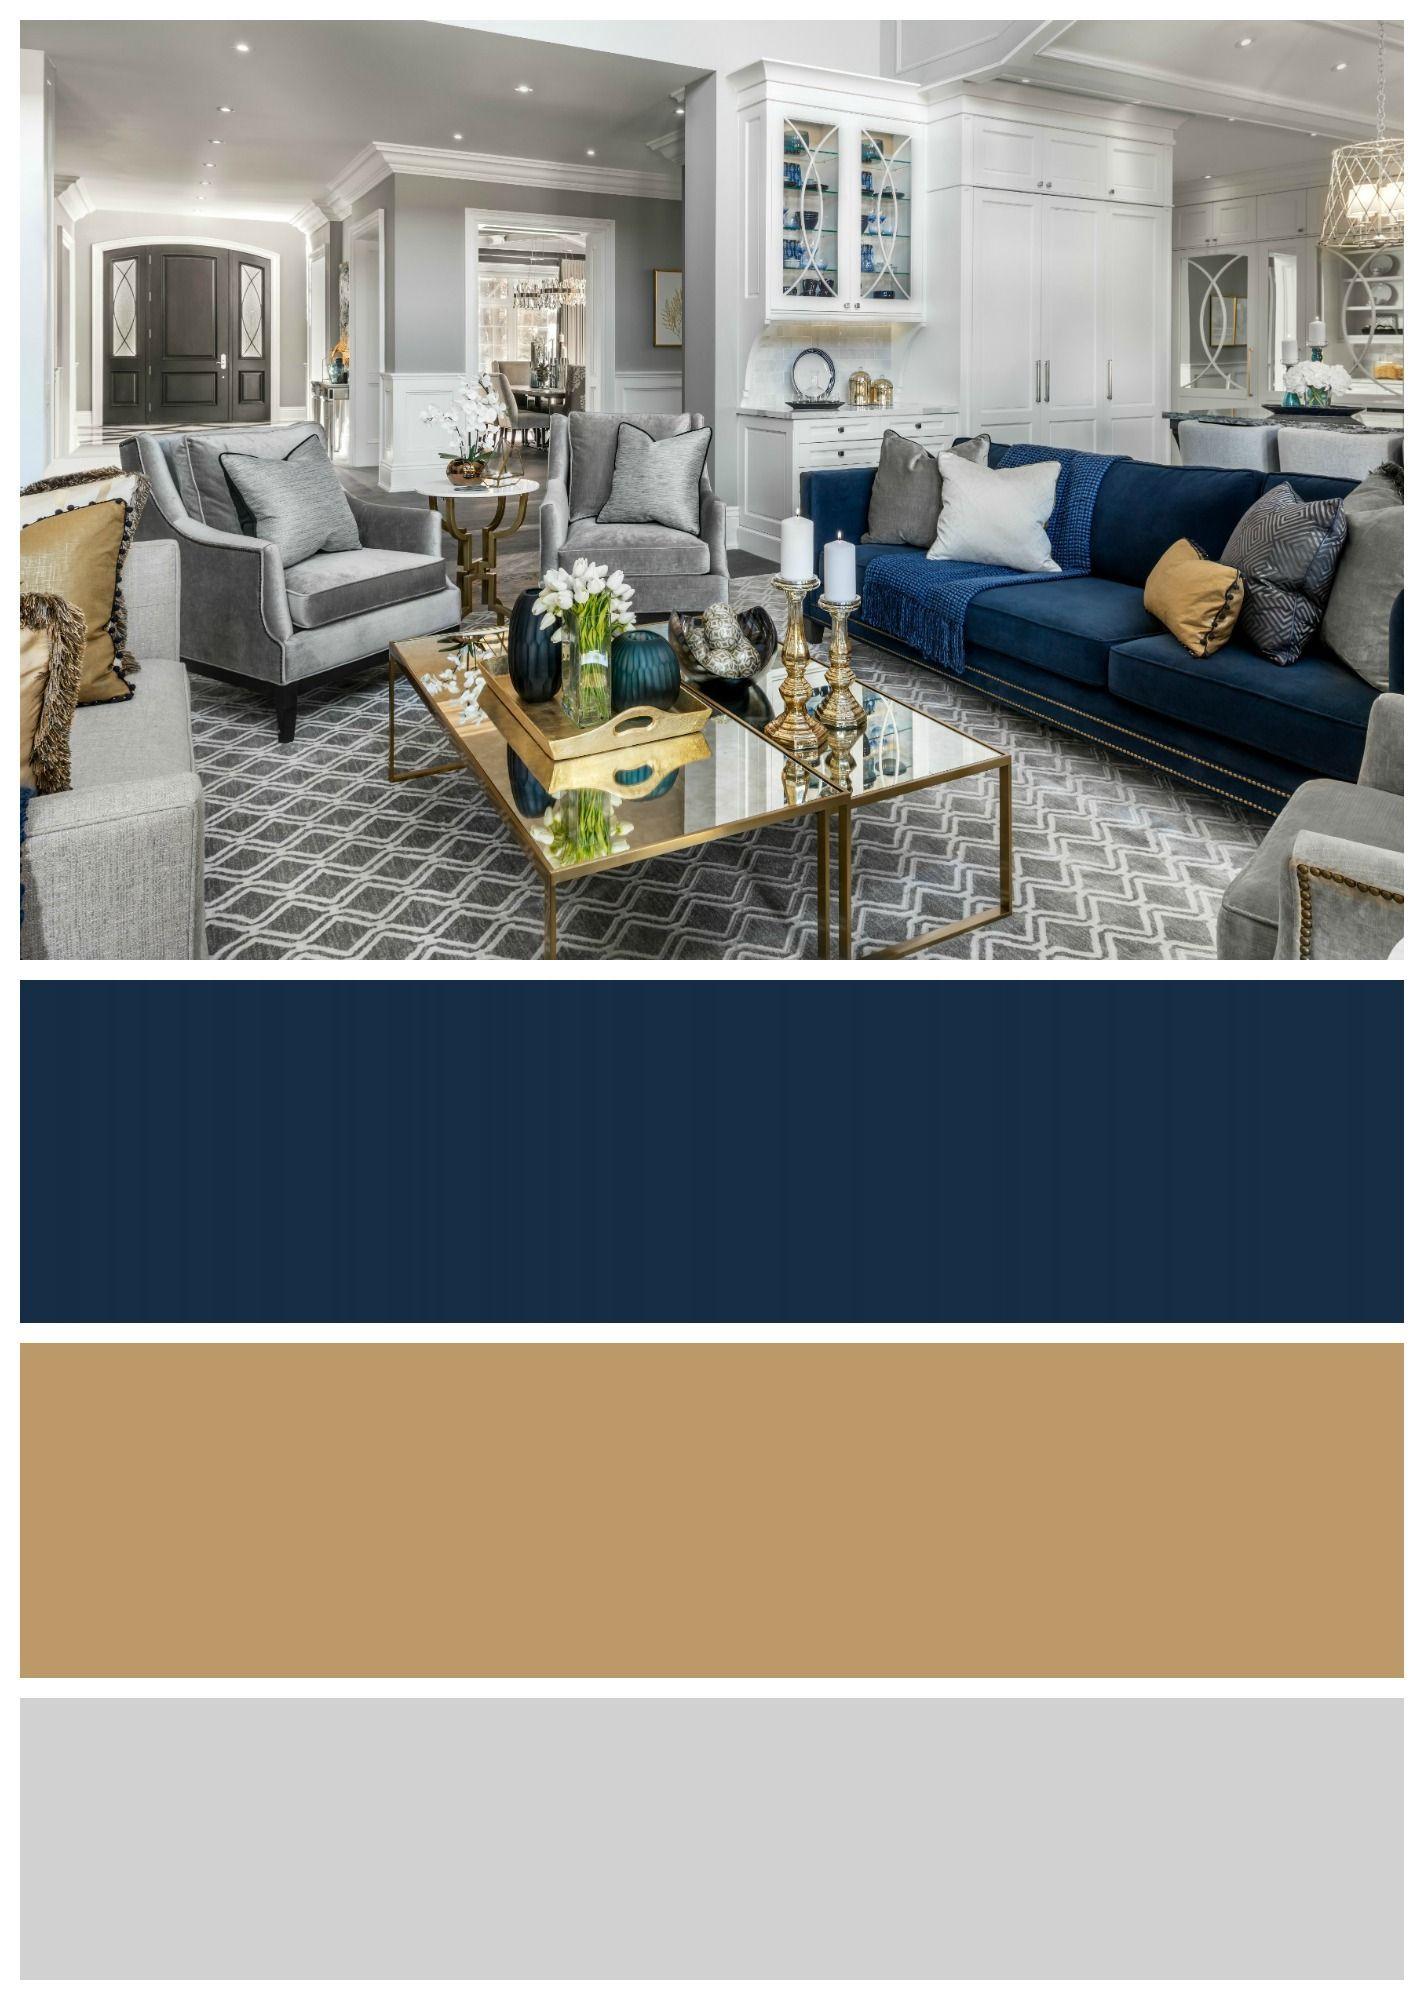 Scott Mcgillivray S Living Room Color Scheme Thiết Kế Mau Sắc Bảng Phối Mau